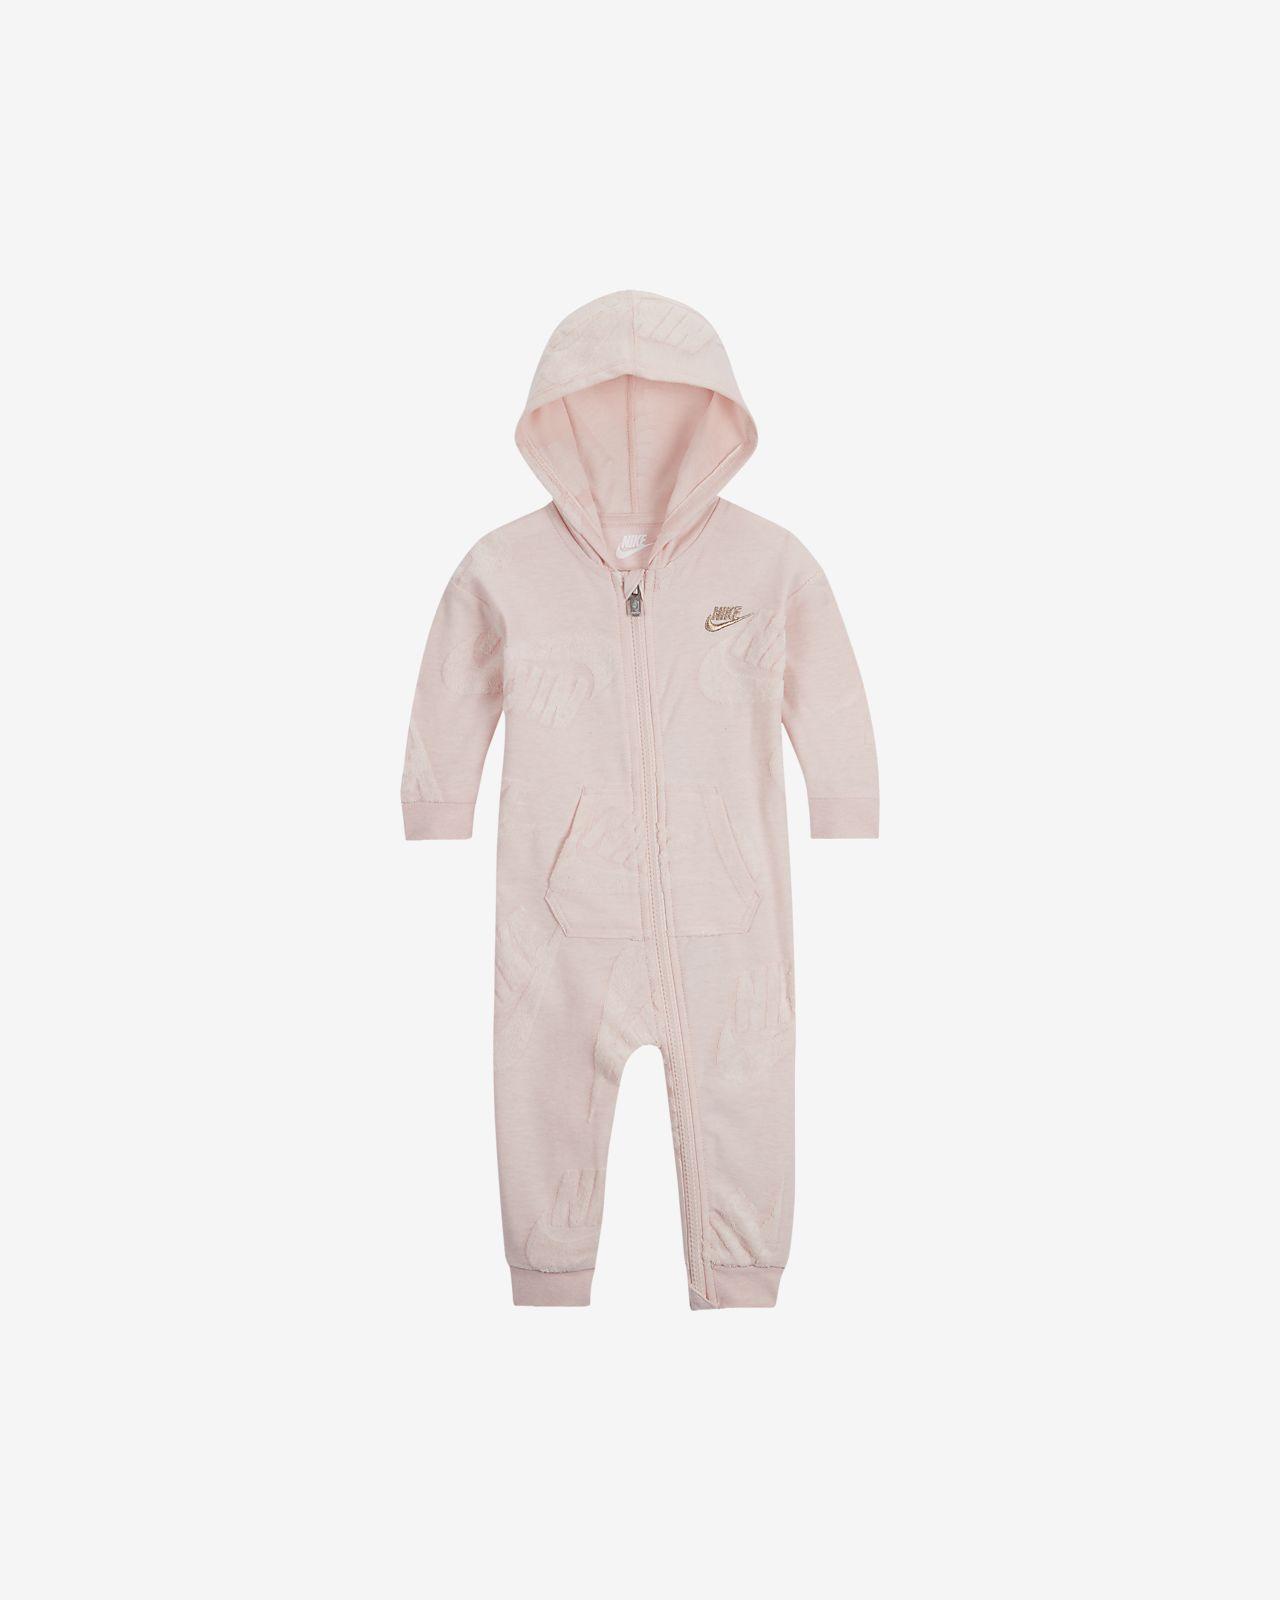 Nike Sportswear Baby (0–9M) Full-Zip Hooded Overalls